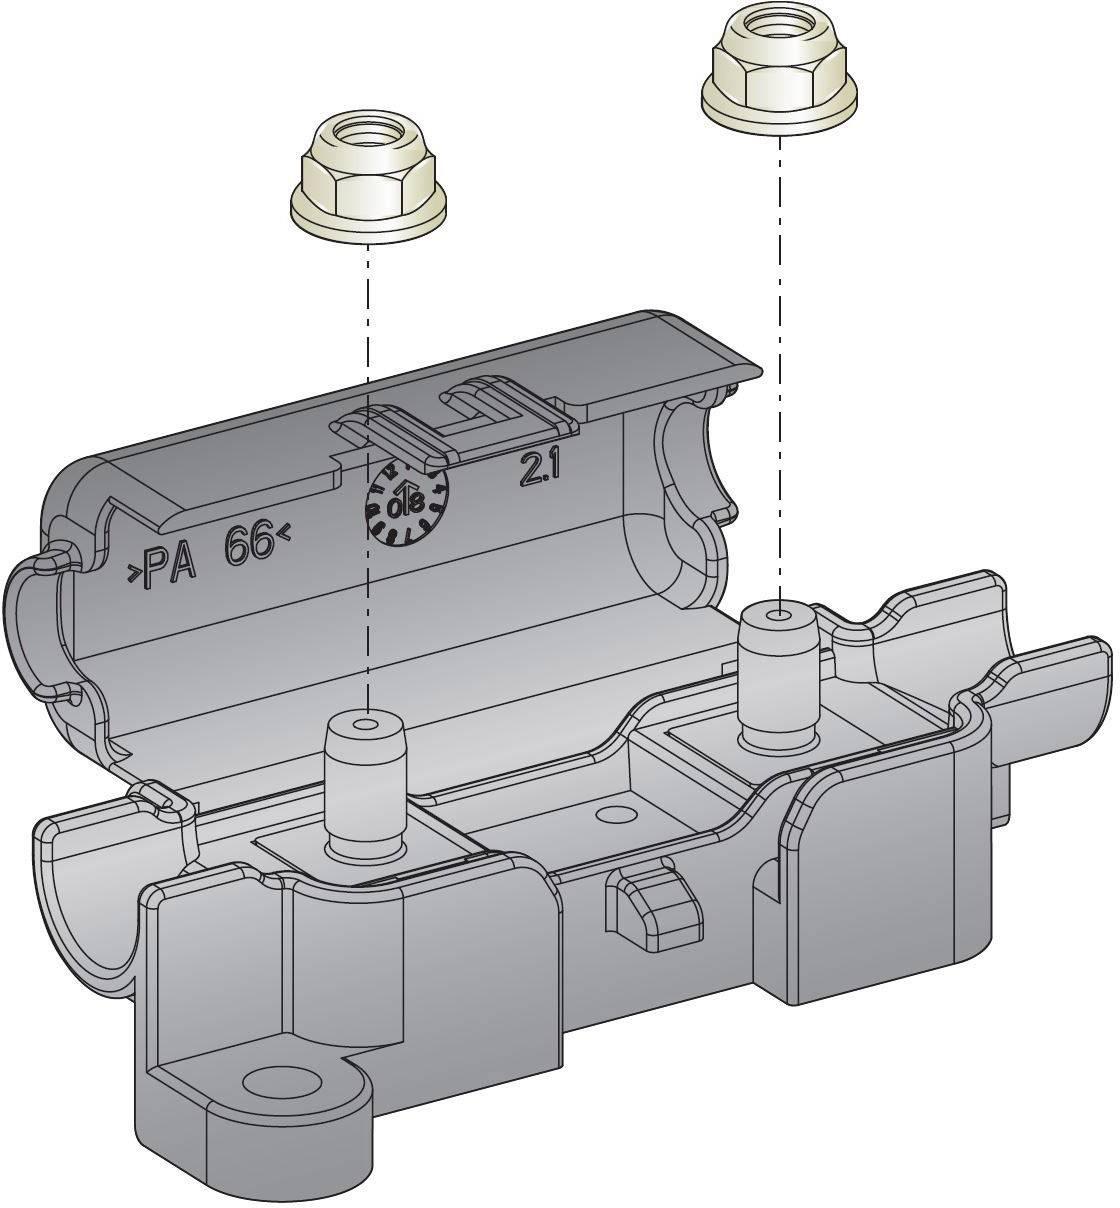 Držák pojistky ESKA 1.003600, 32 V/DC, 70 x 25 x 22 mm